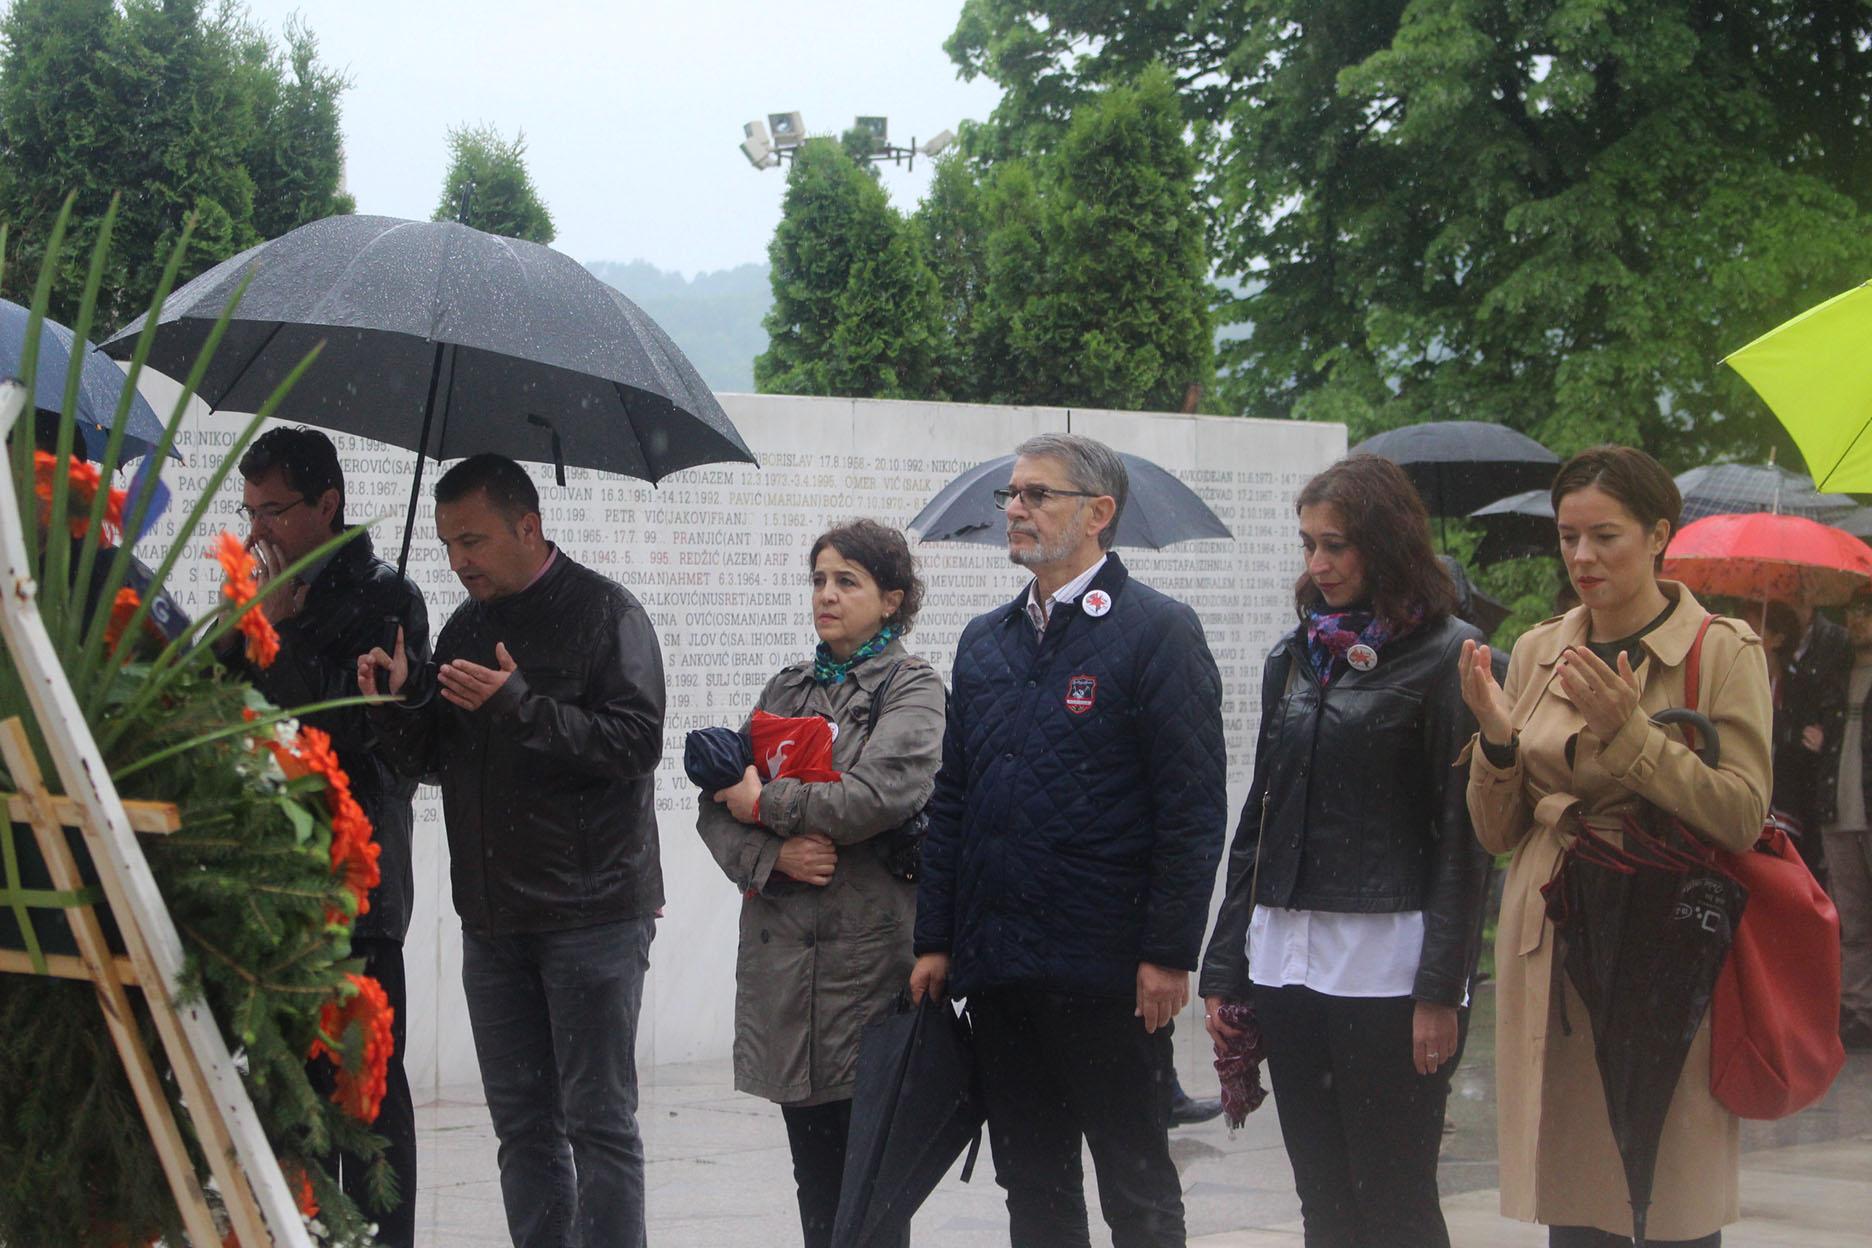 Obilježen 9. maj/svibanj- Dan pobjede nad fašizmom, Dan Evrope, Dan Zlatnih ljiljana